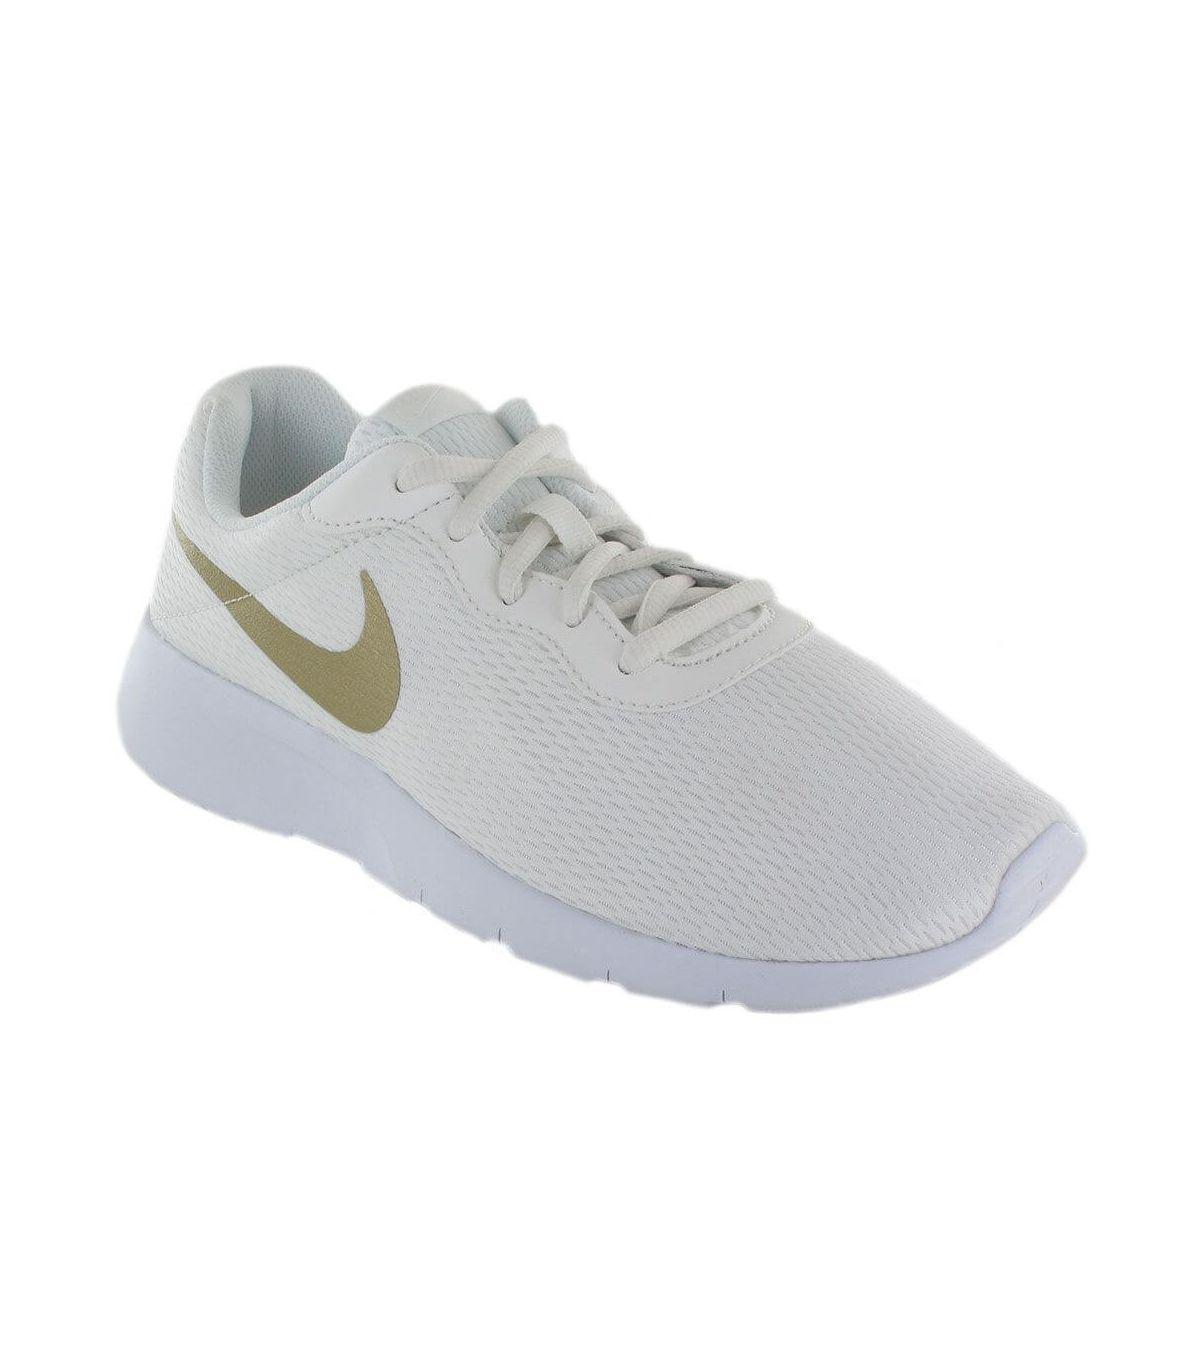 Nike Tanjun GS White